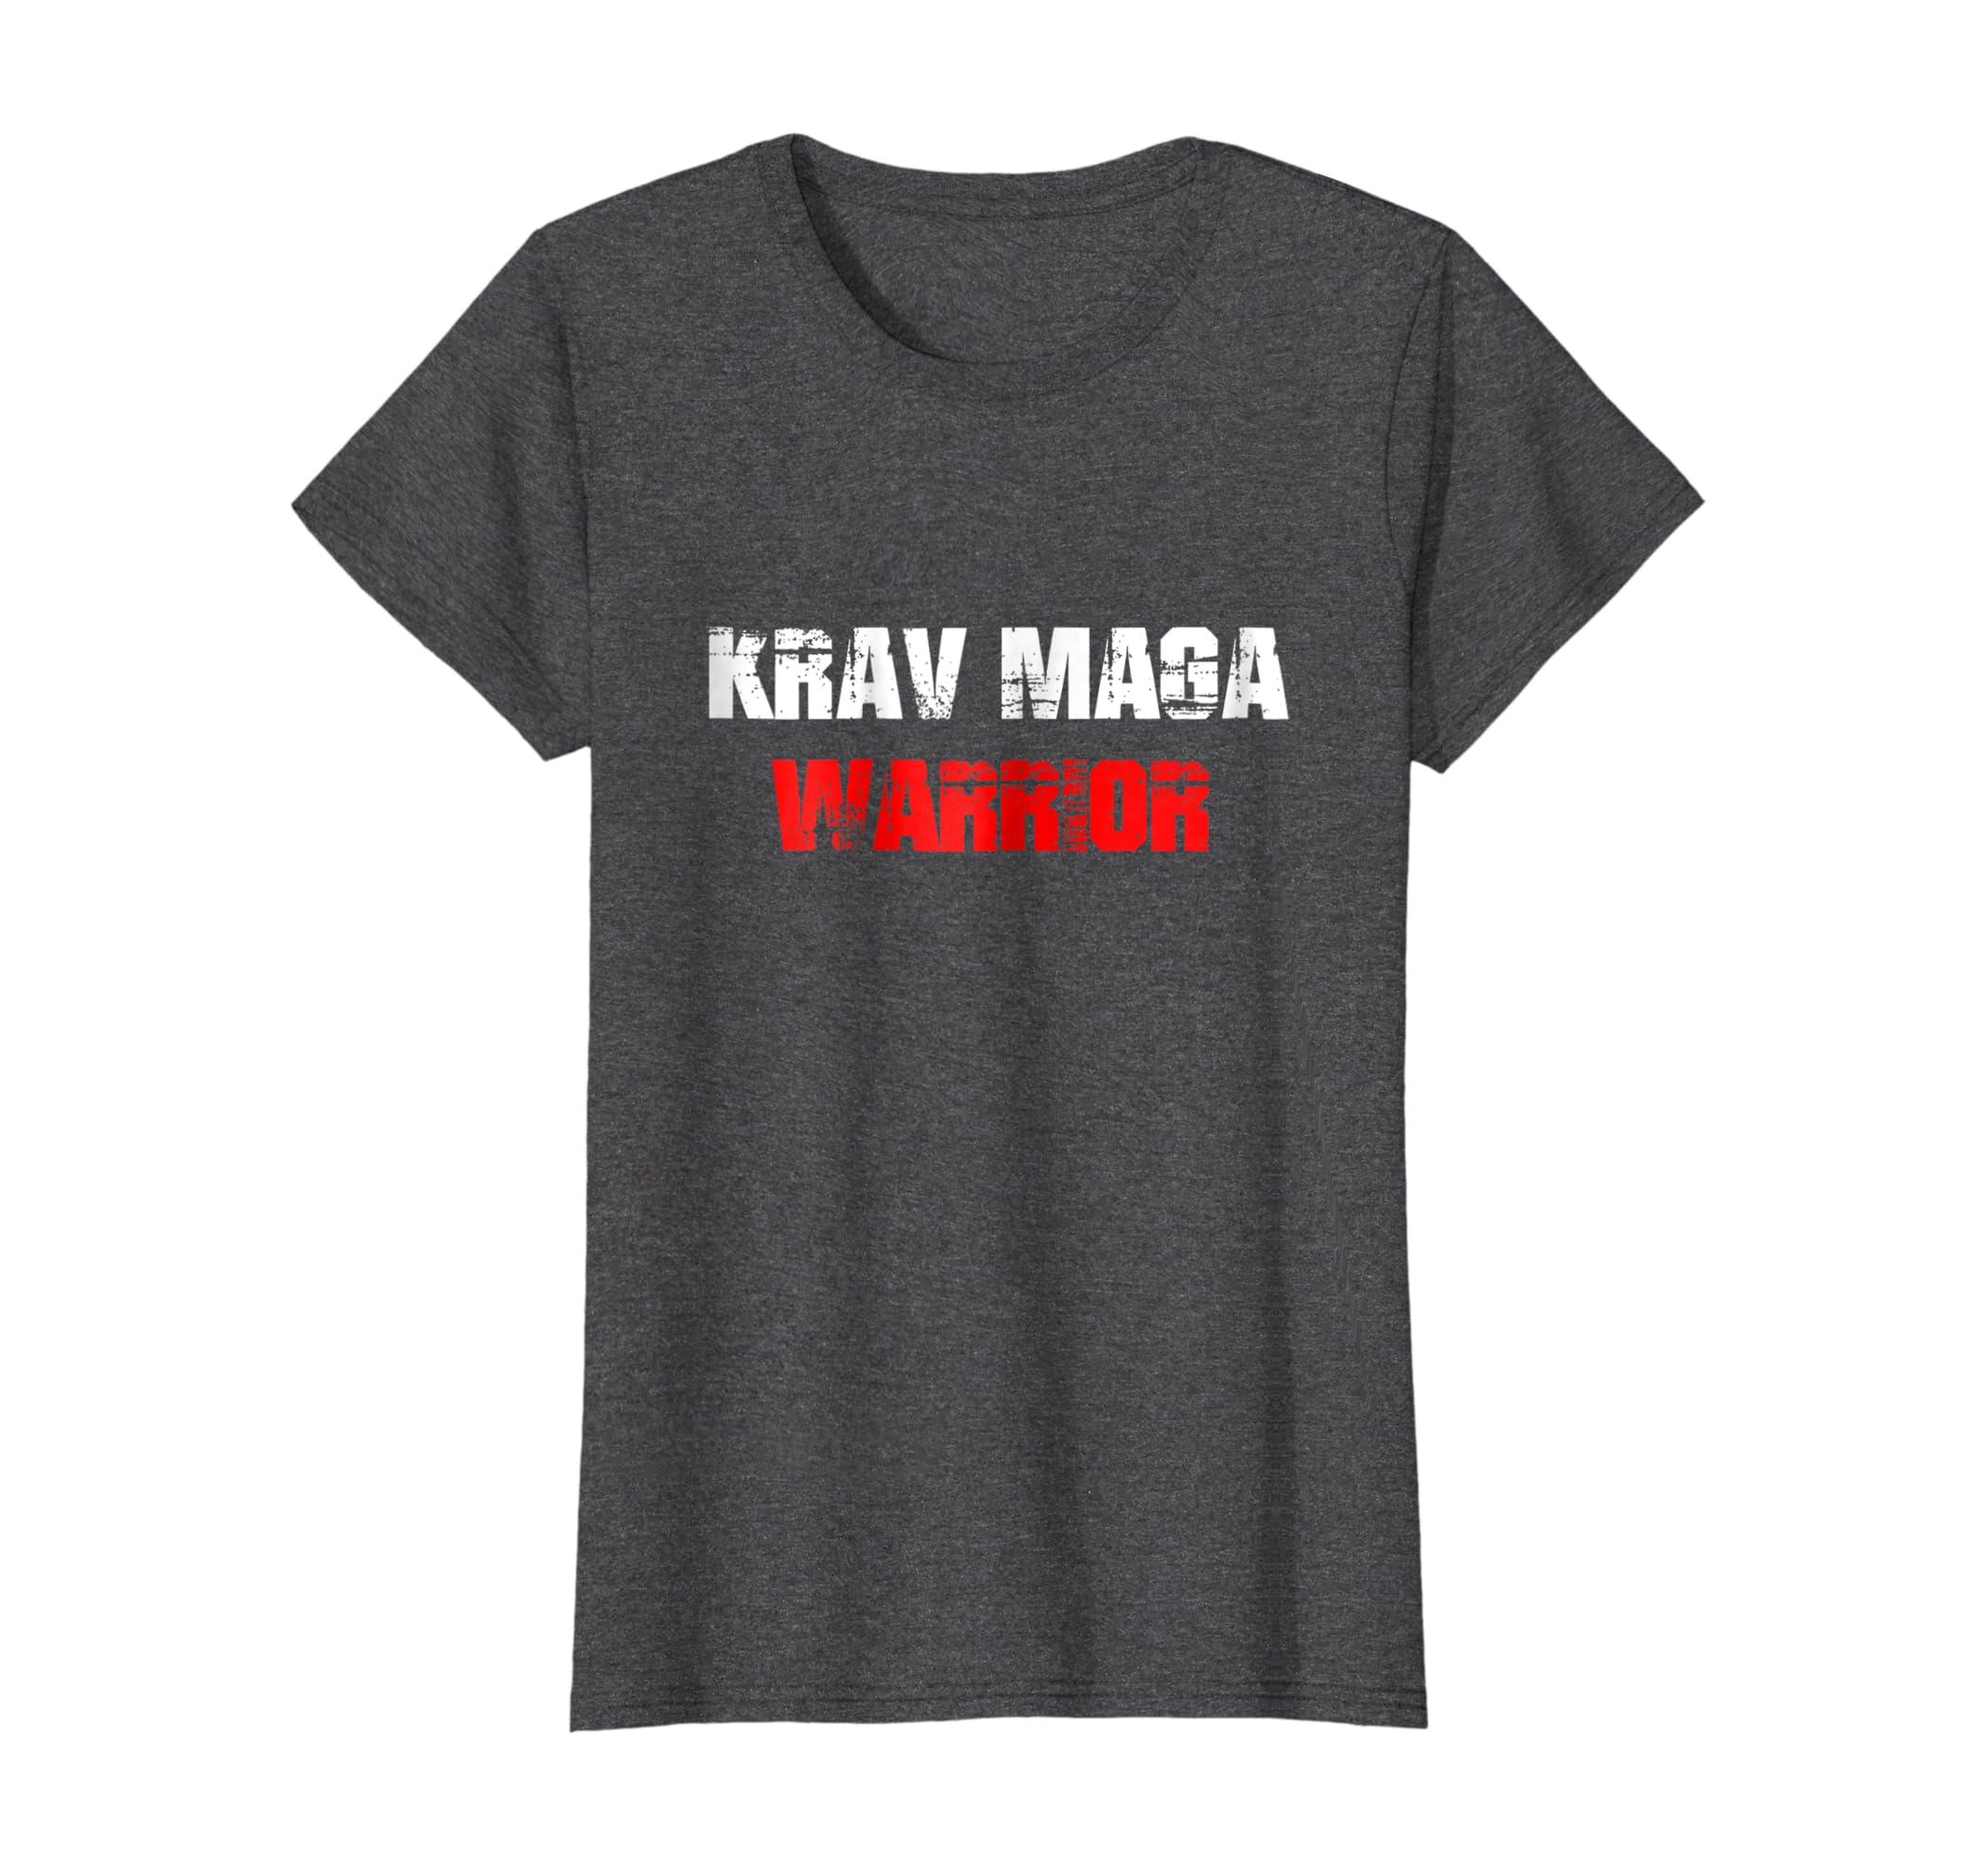 Krav Maga Warrior Shirt Israeli Combat Self Defense Fighting-Awarplus